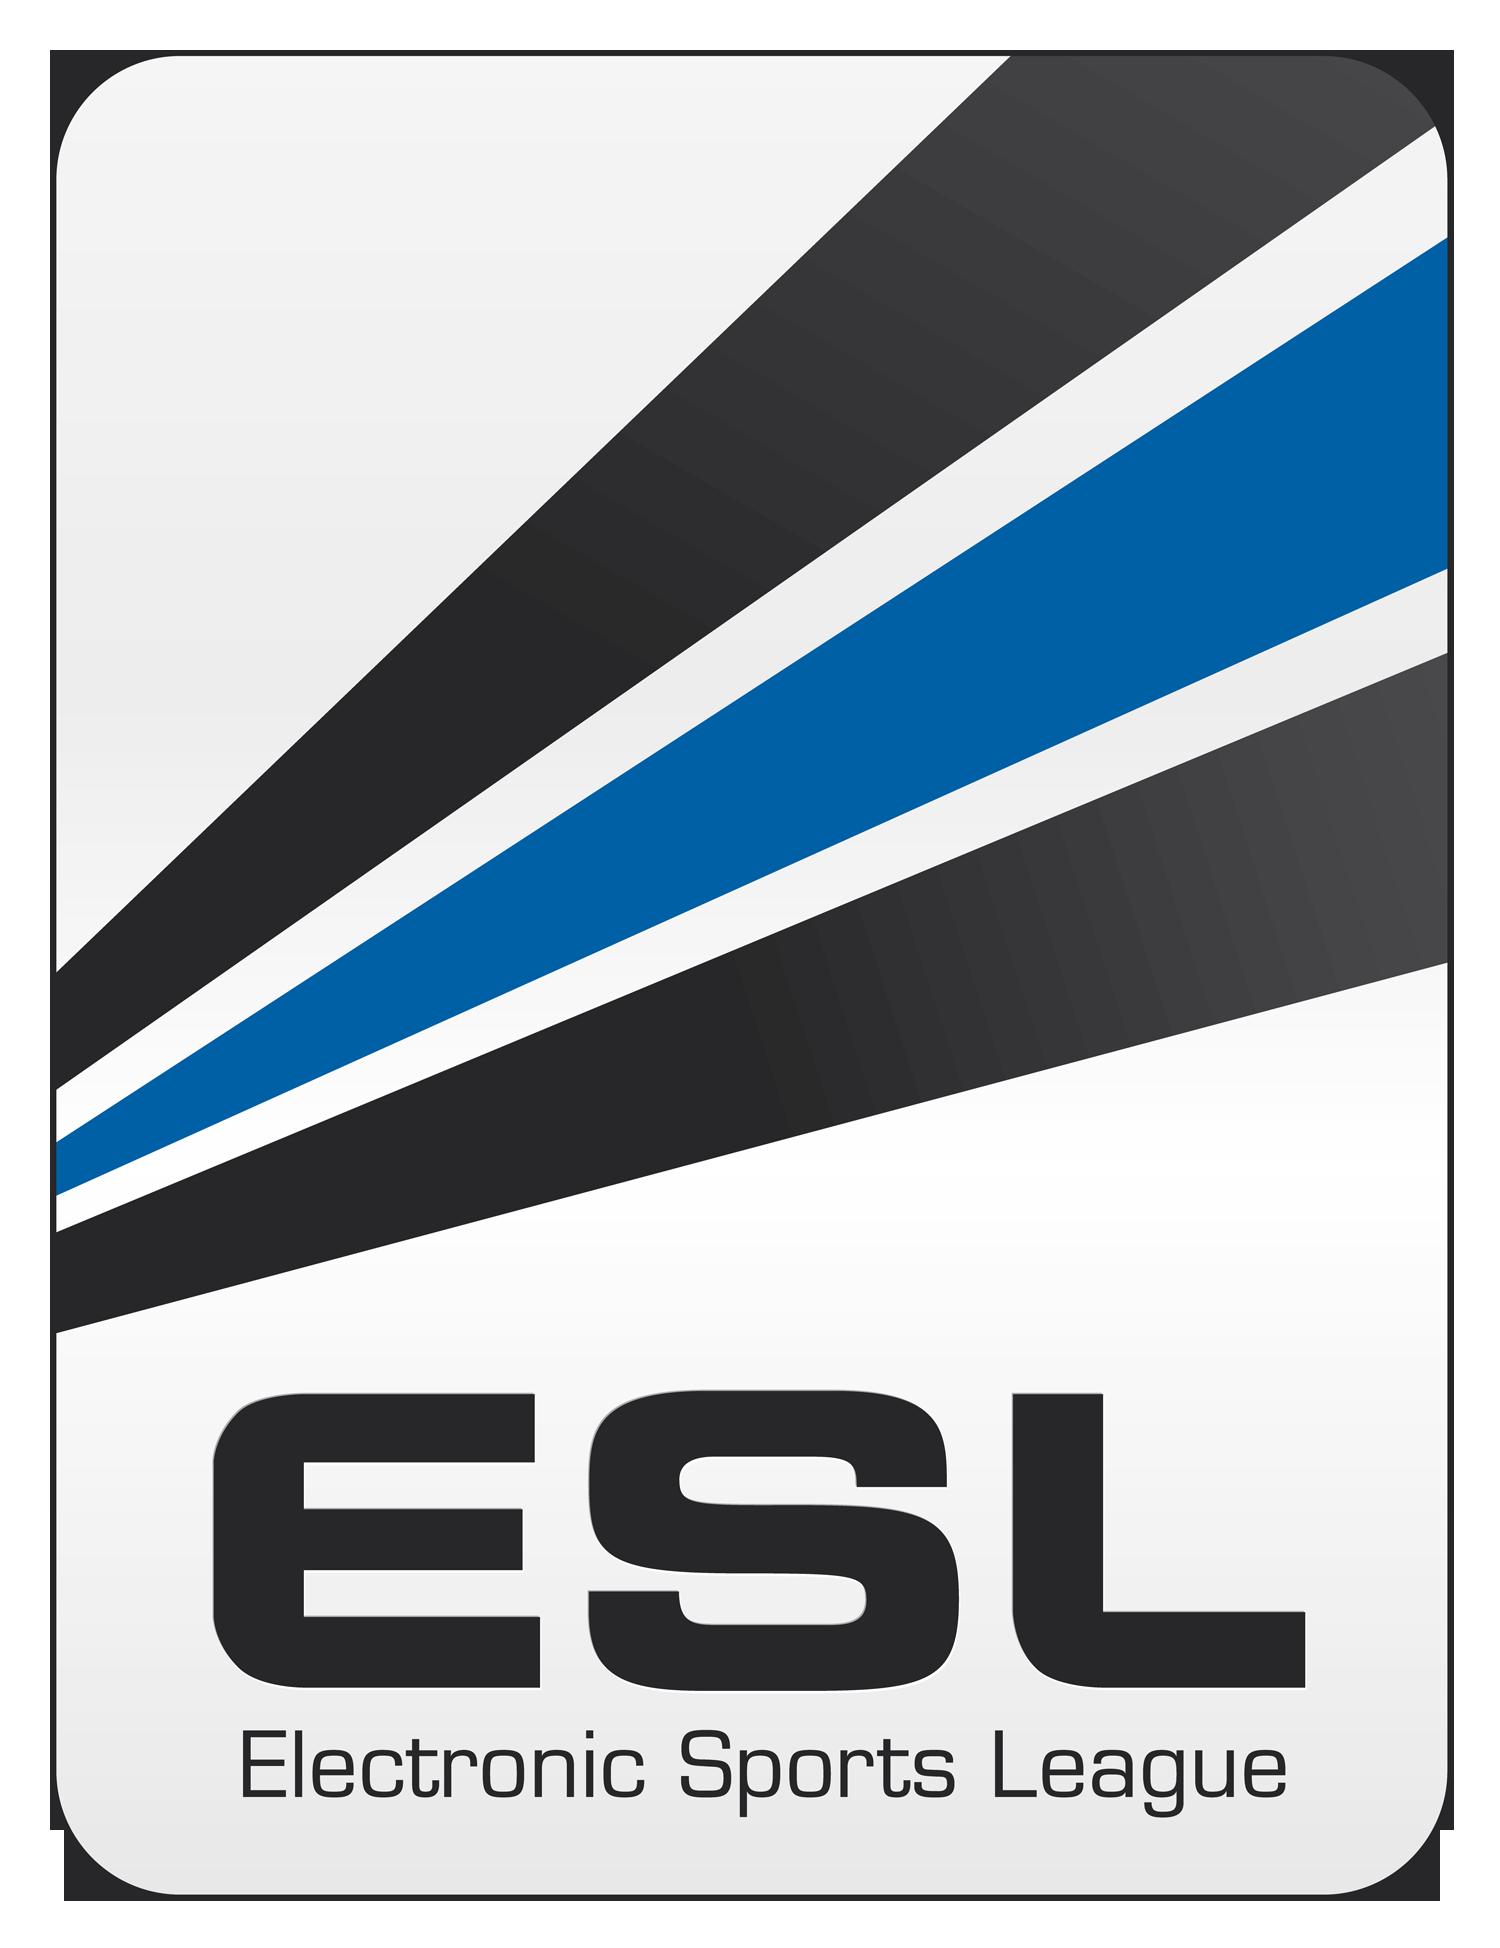 Logo_ESL_ElectronicSportsLeague (1).png